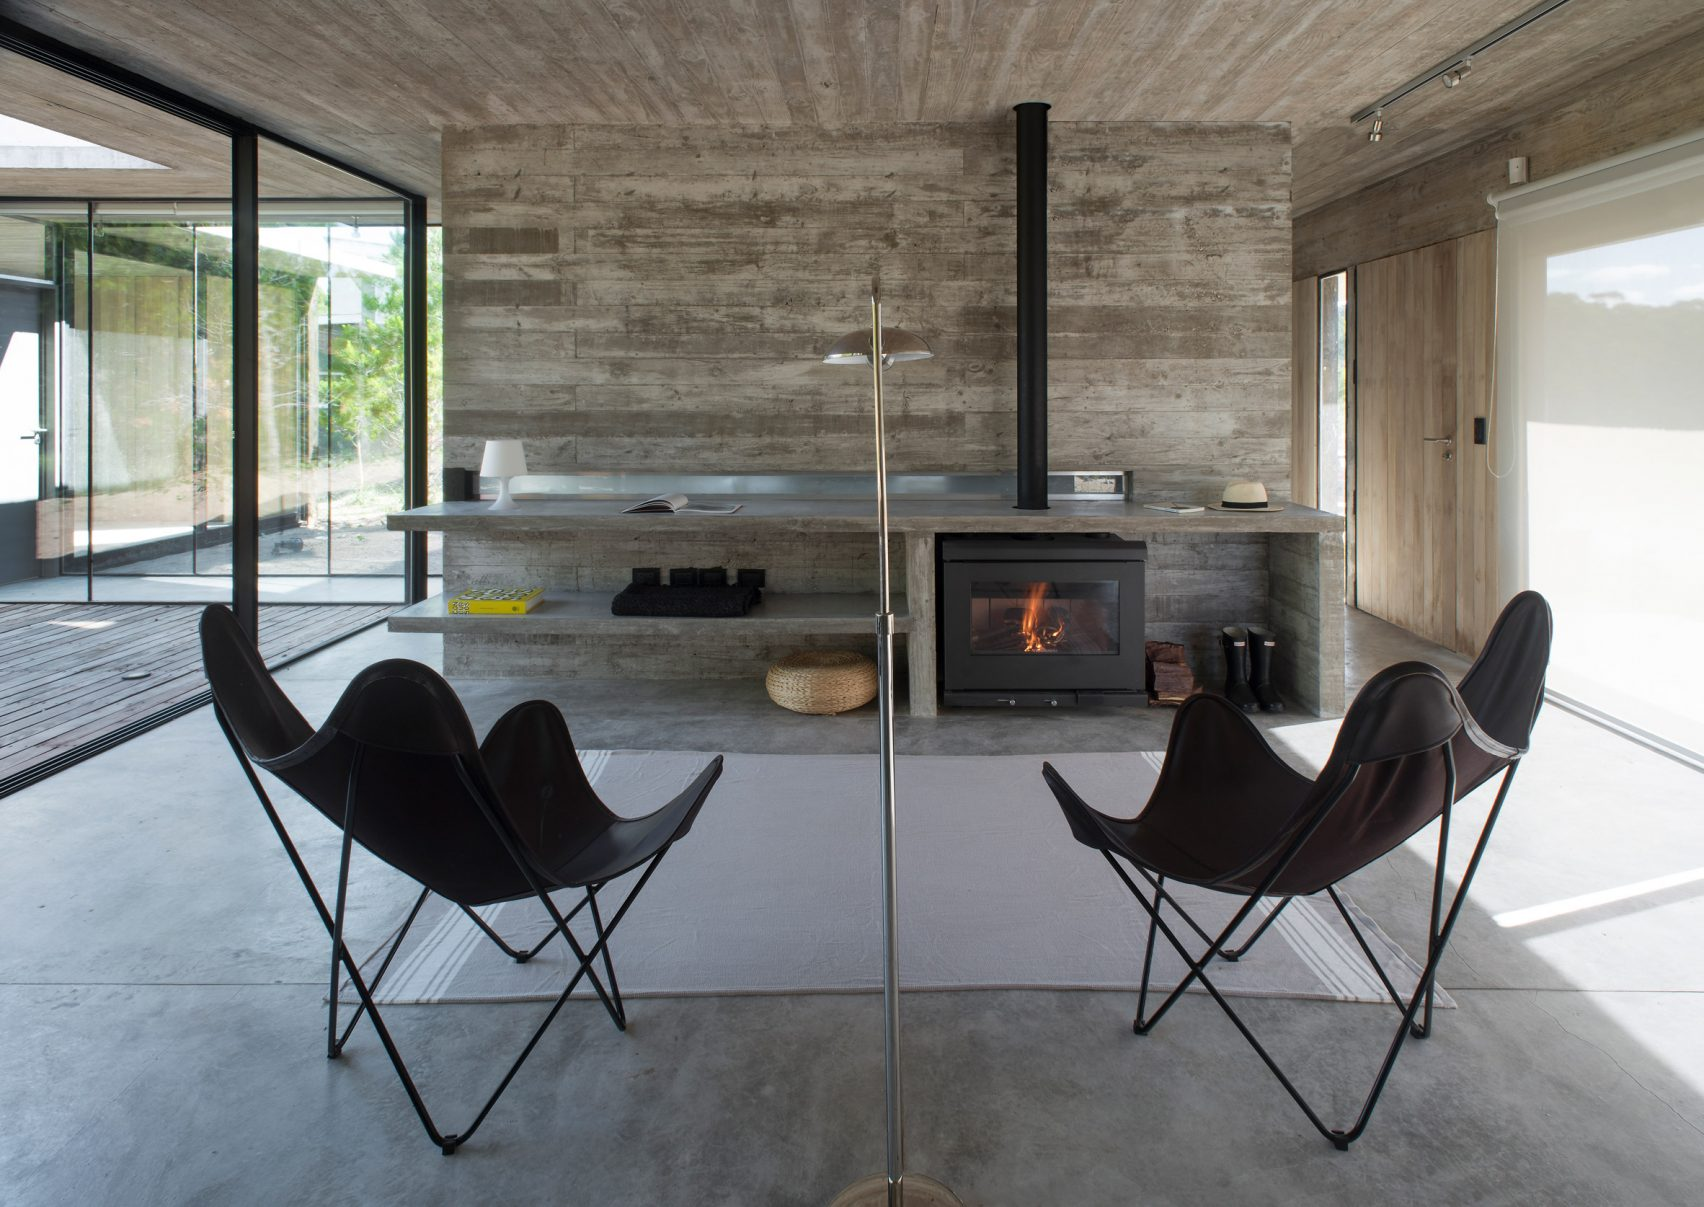 casa-ecuestre-luciano-kruk-house-residence-buenos-aires_dezeen_2364_col_16-1704x1207